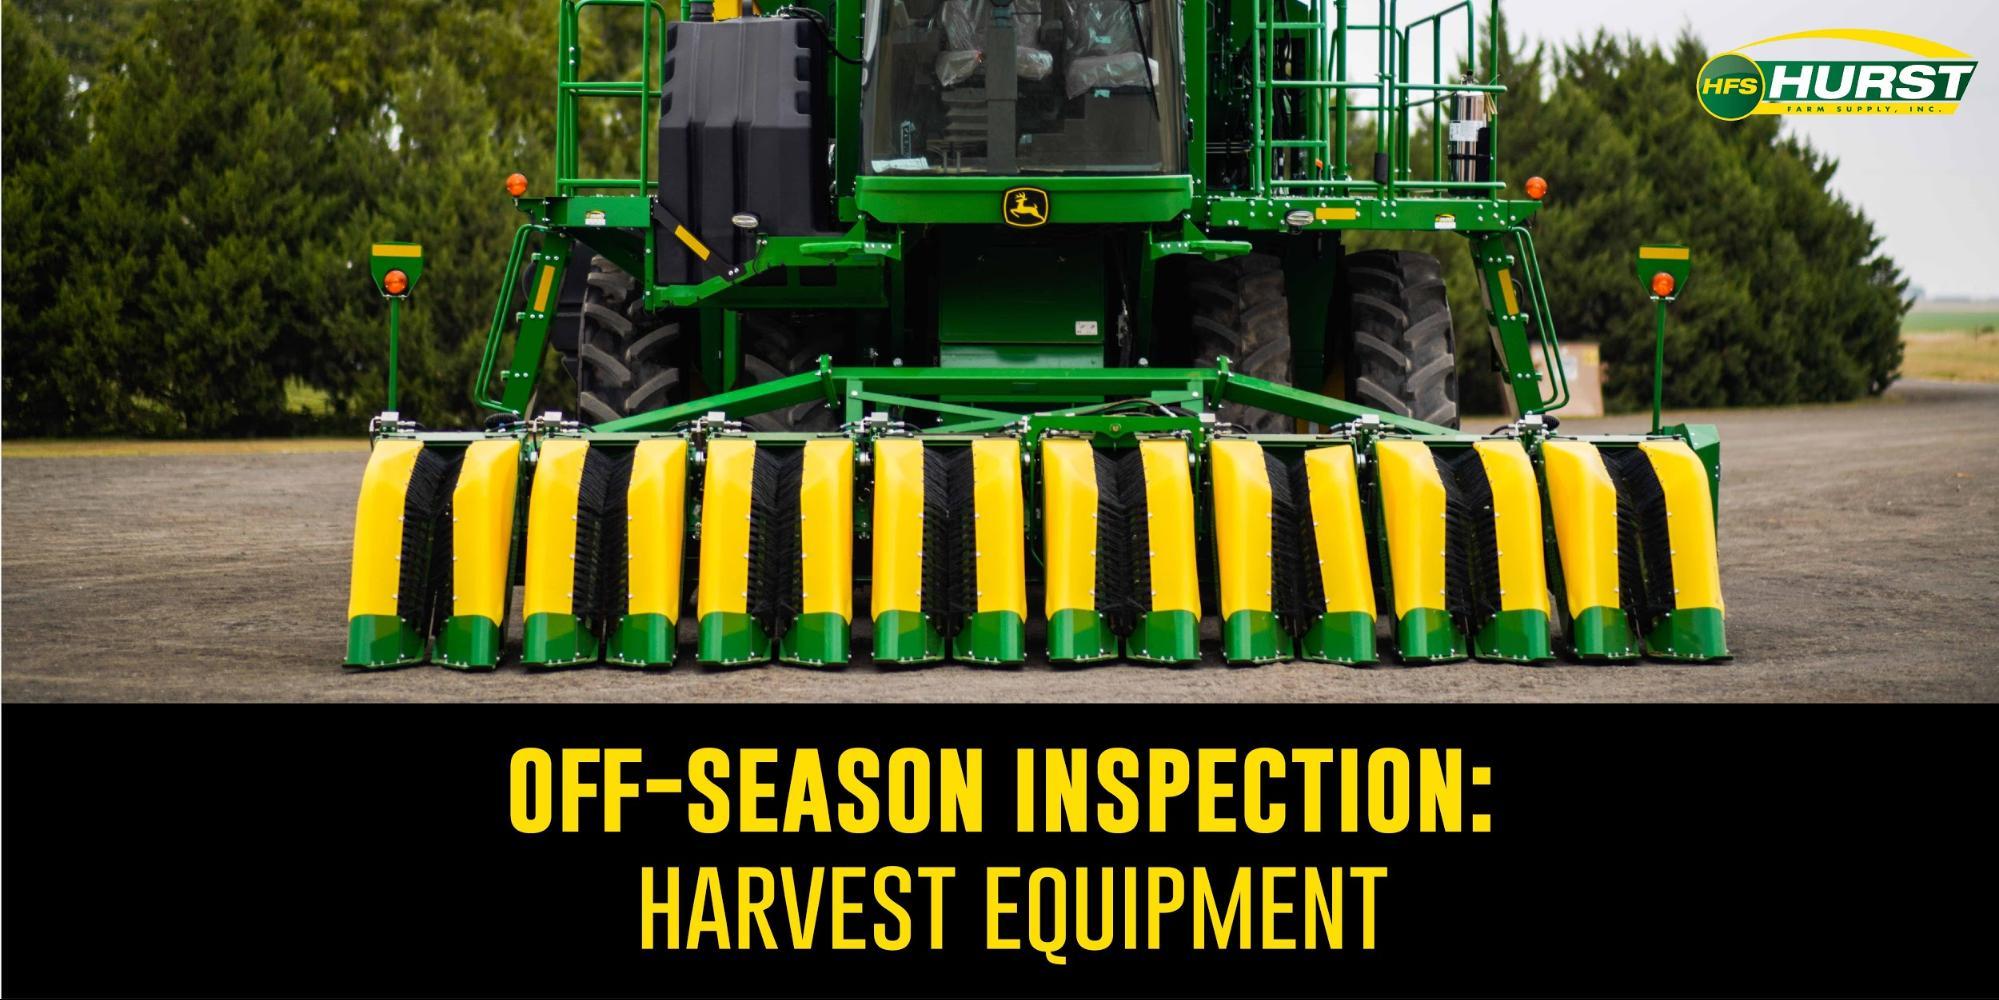 Off-SeasonInspection: Harvest Equipment